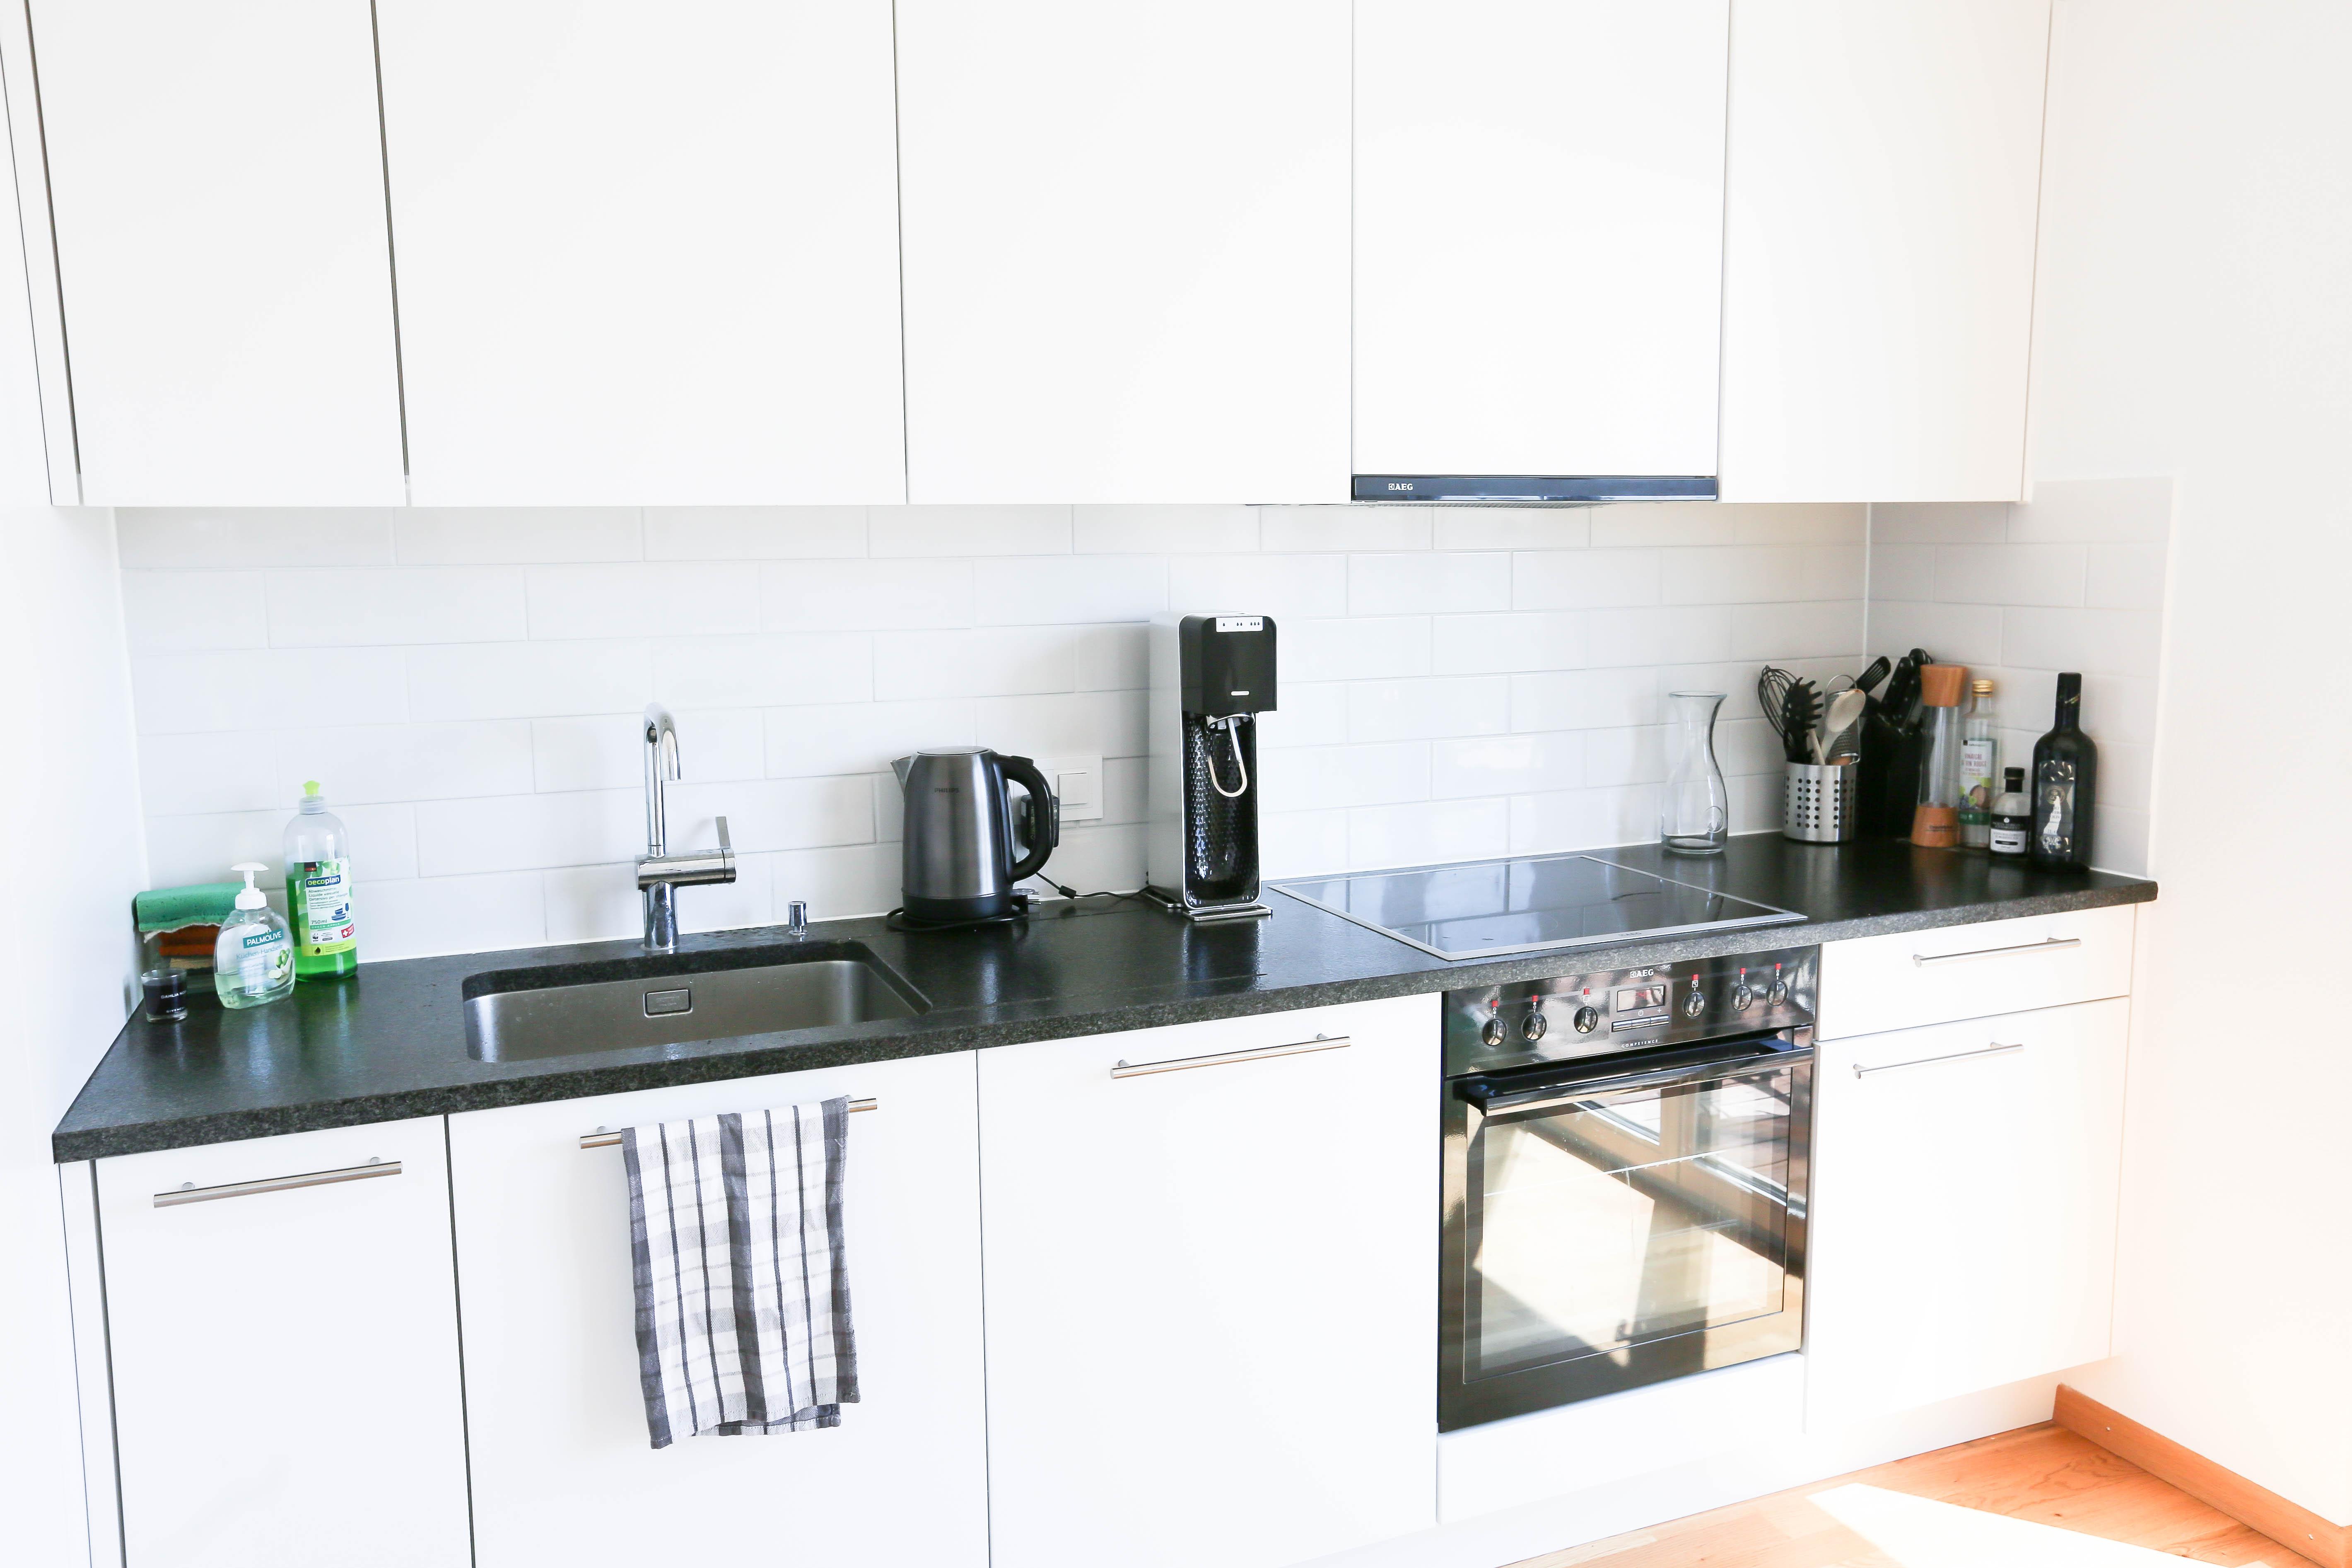 nettoyer sa maison avec des produits naturels ally bing. Black Bedroom Furniture Sets. Home Design Ideas